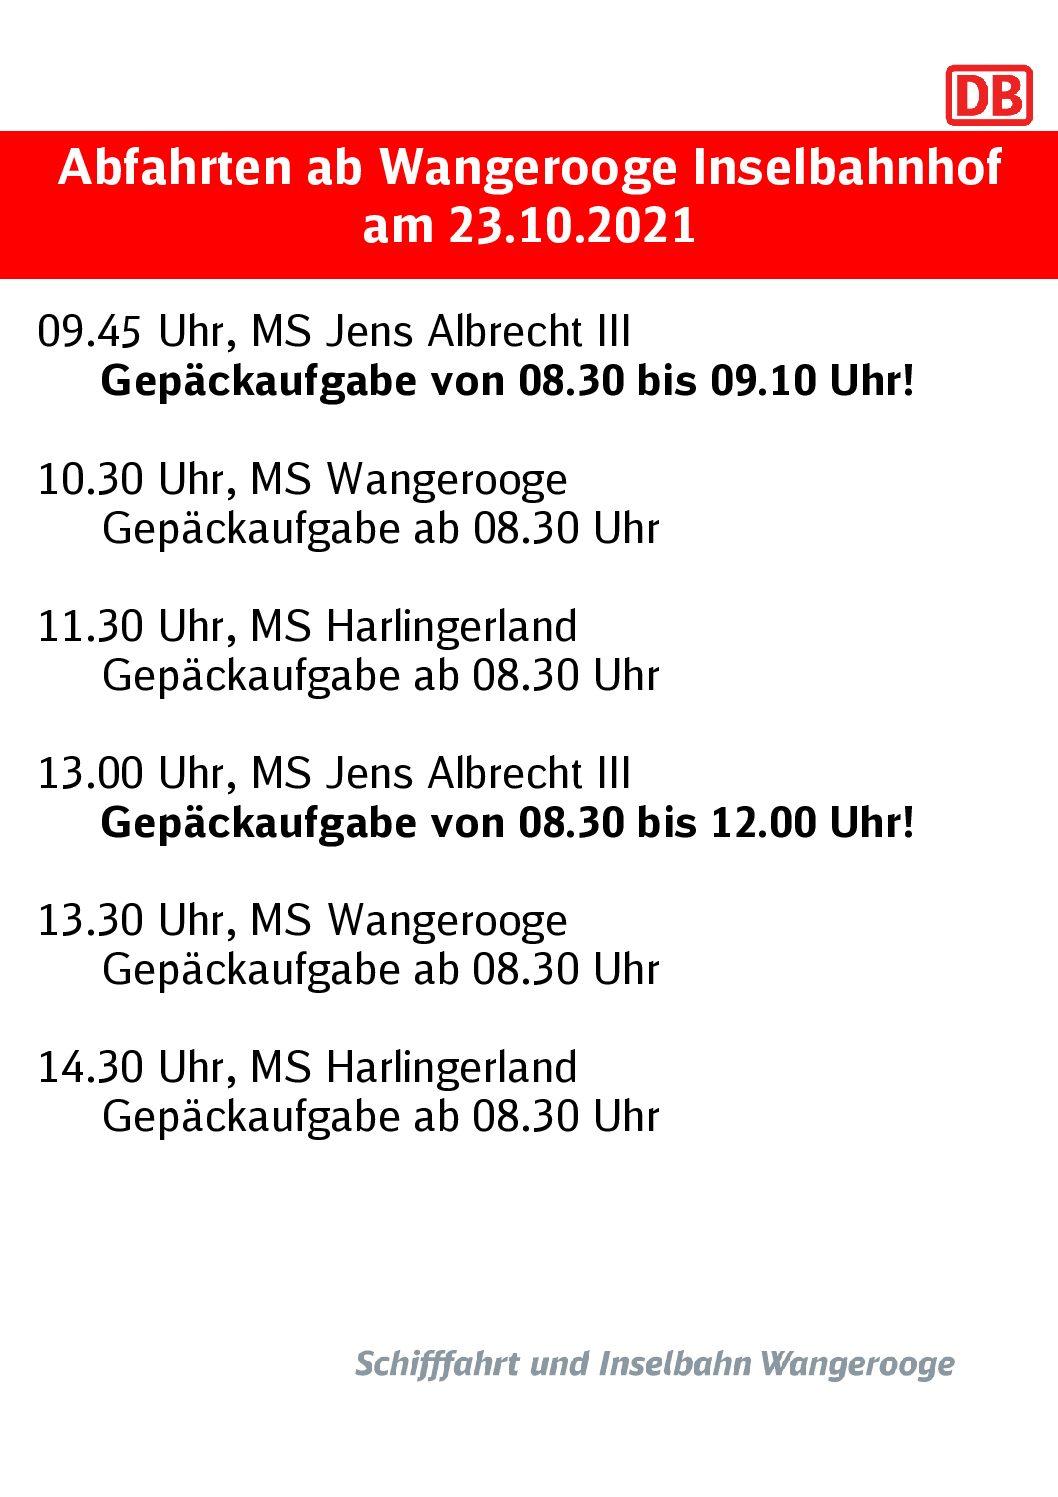 Abfahrten ab Wangerooge 23.102021